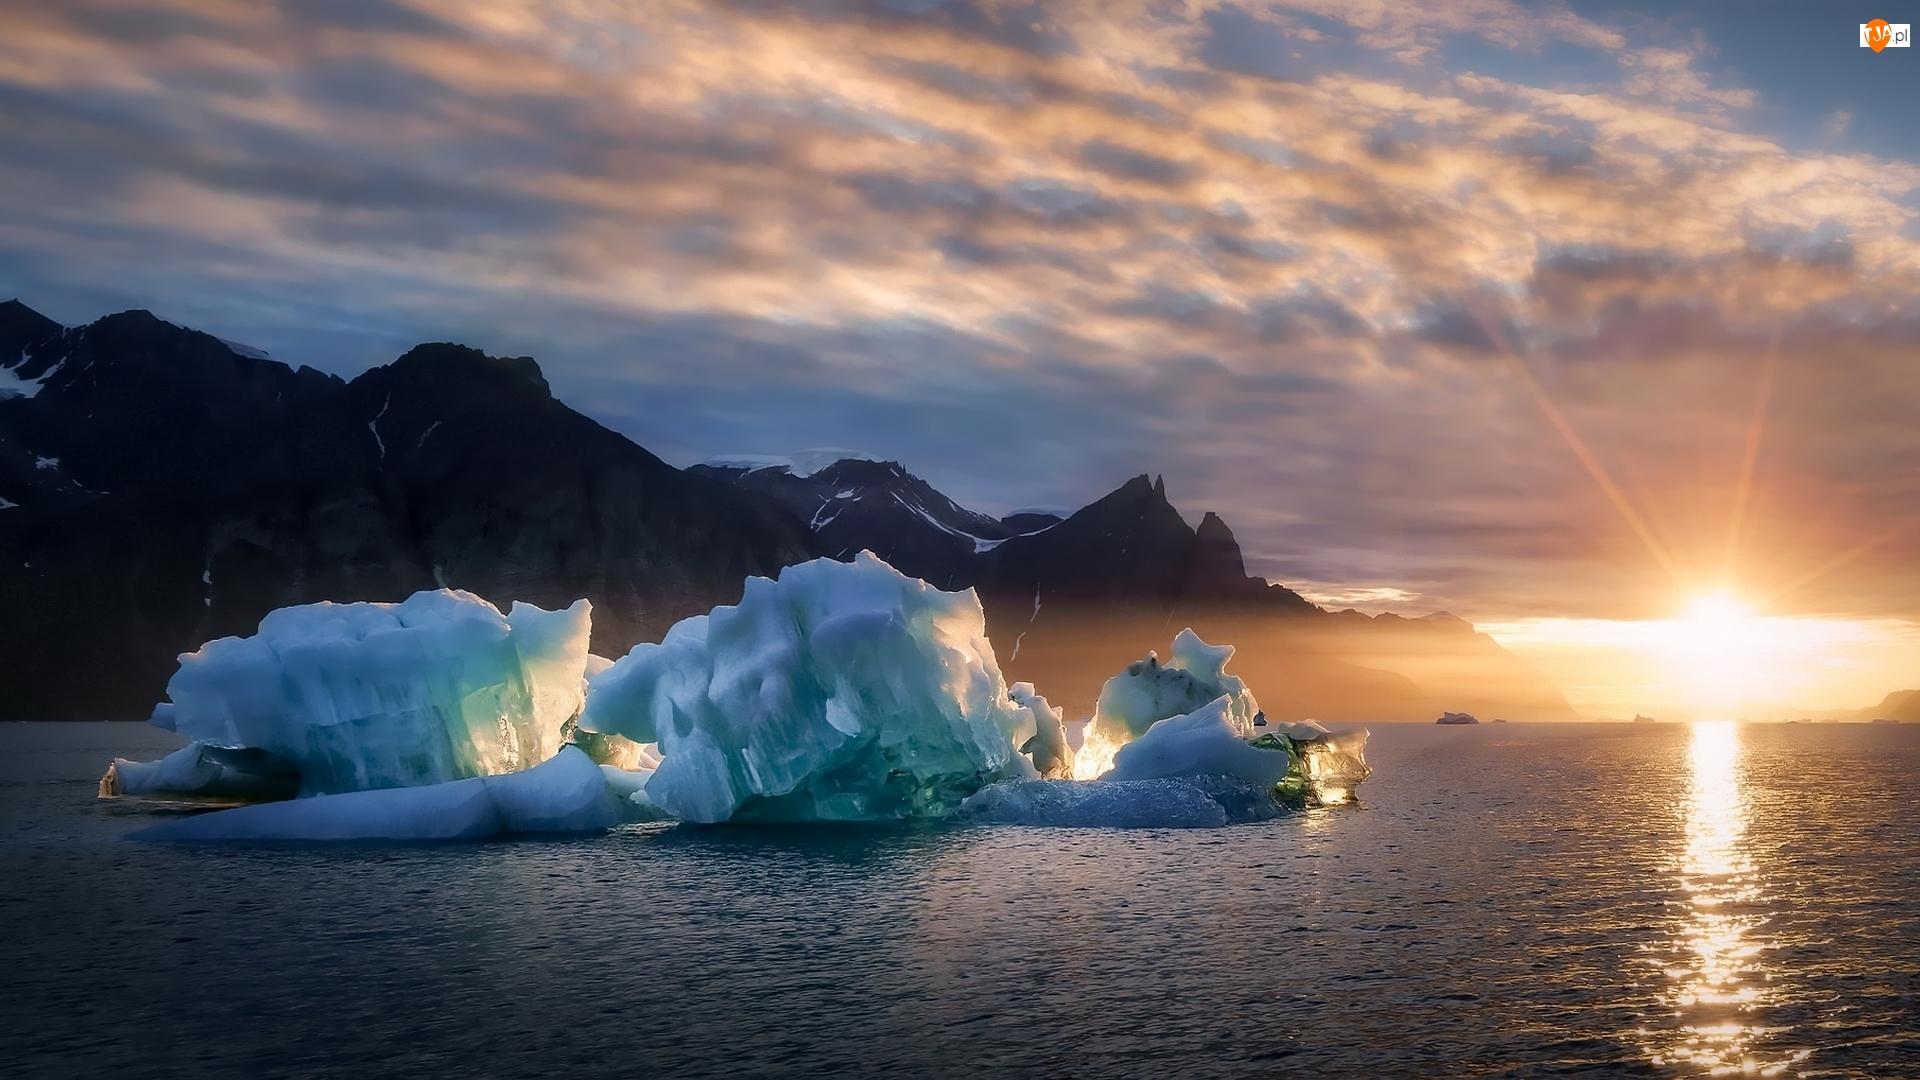 Lód, Grenlandia, Wschód Słońca, Fiord Kangertittivaq, Bryły